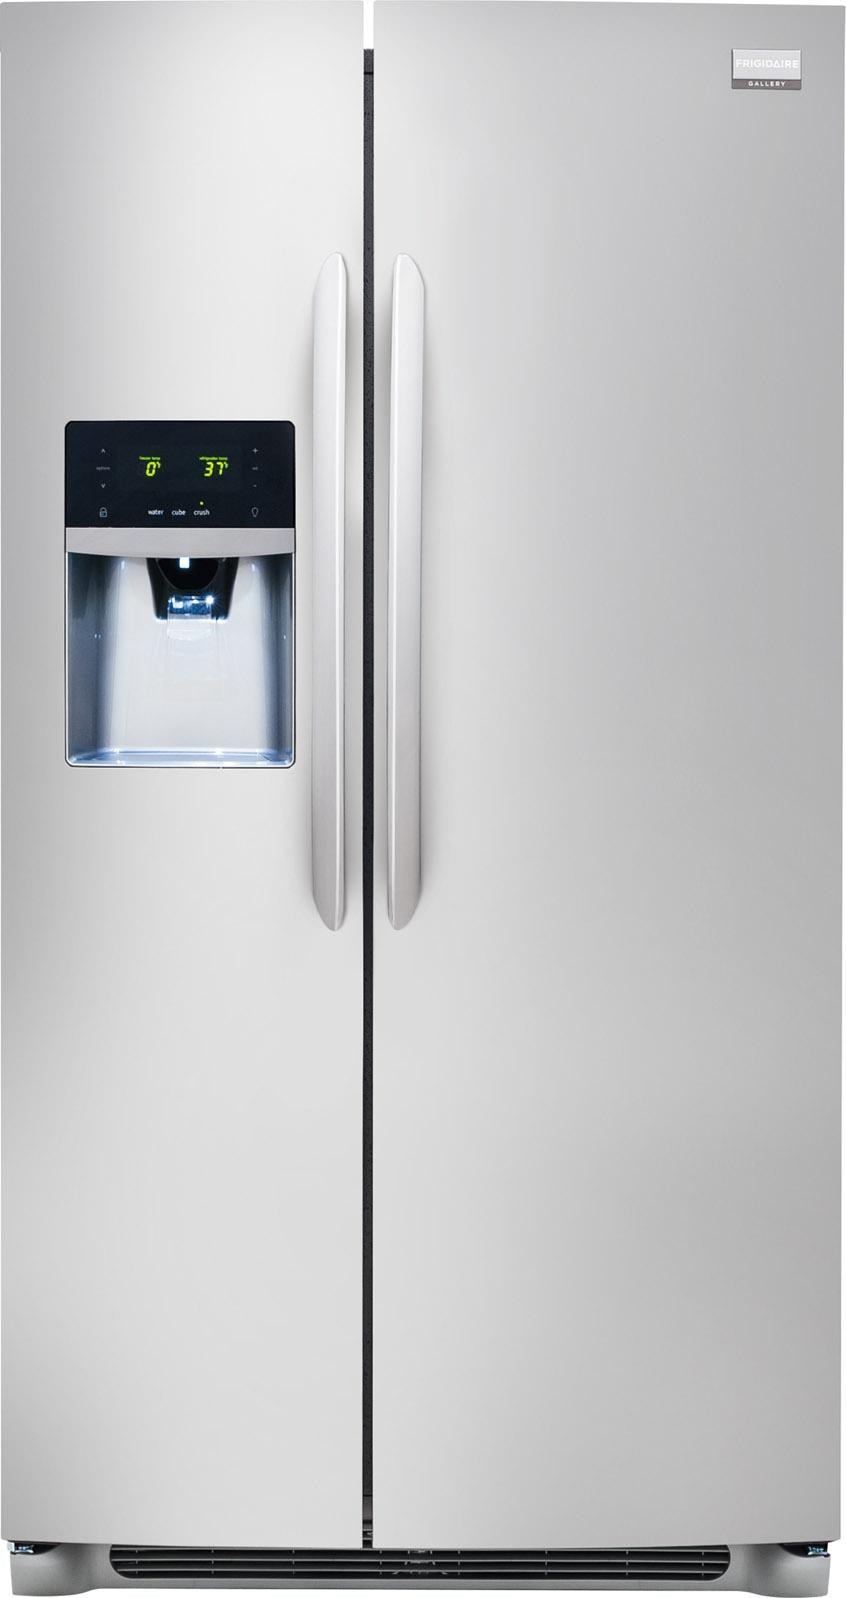 Frigidaire Frigidaire Gallery Refrigerators26 Cu. Ft. Side By Side  Refrigerator ...